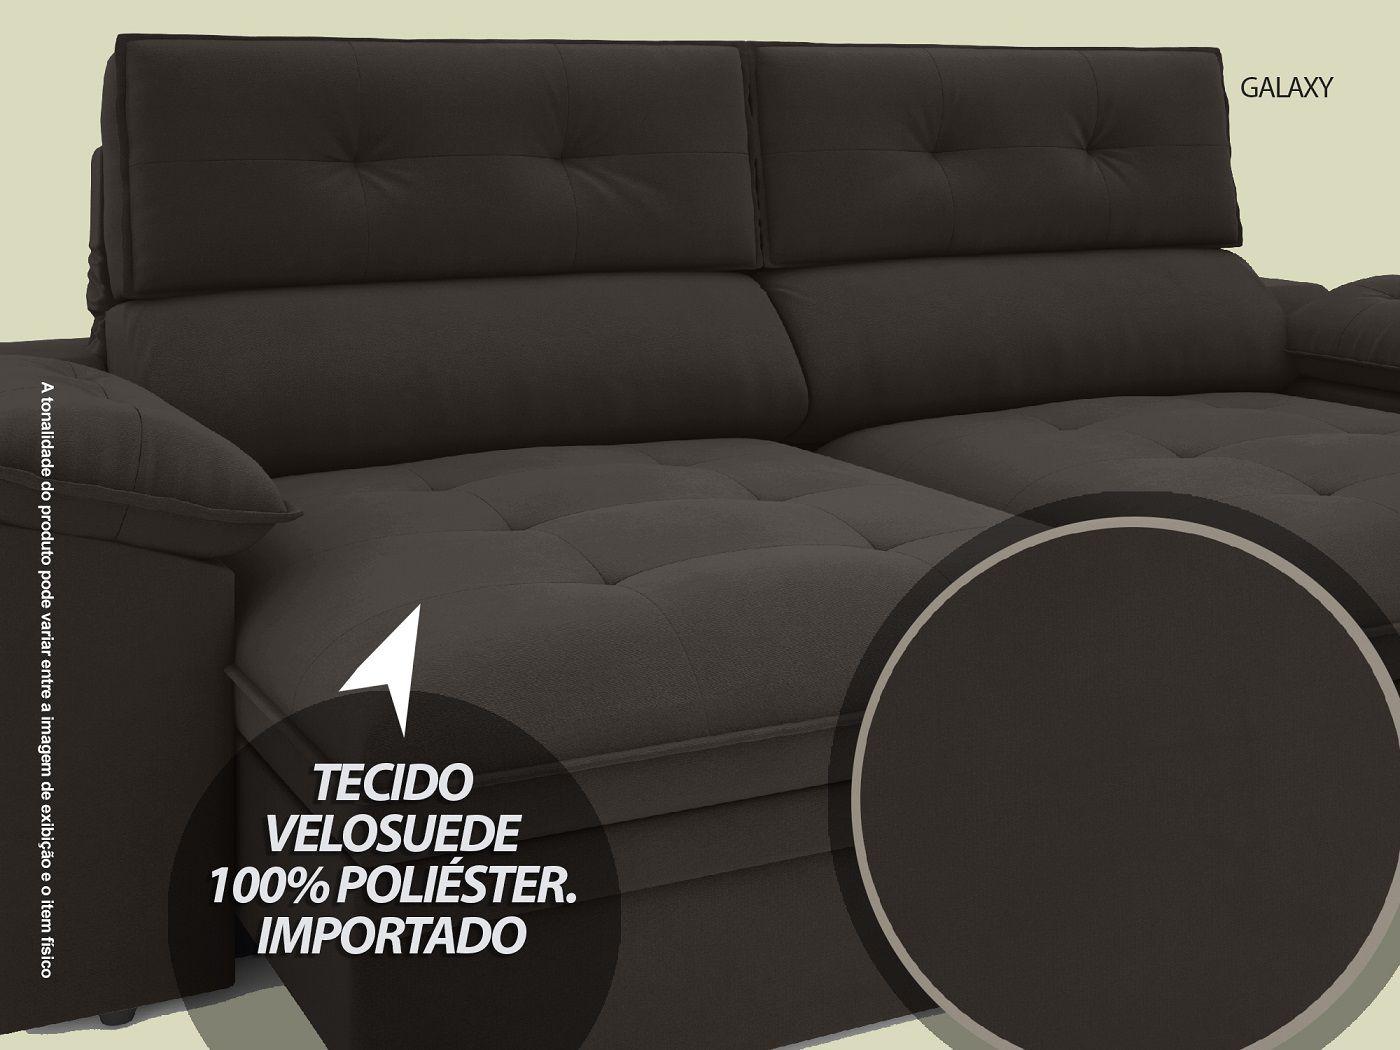 Sofá Galaxy 2,23m Retrátil e Reclinável Com Baú Velosuede Chocolate - NETSOFAS